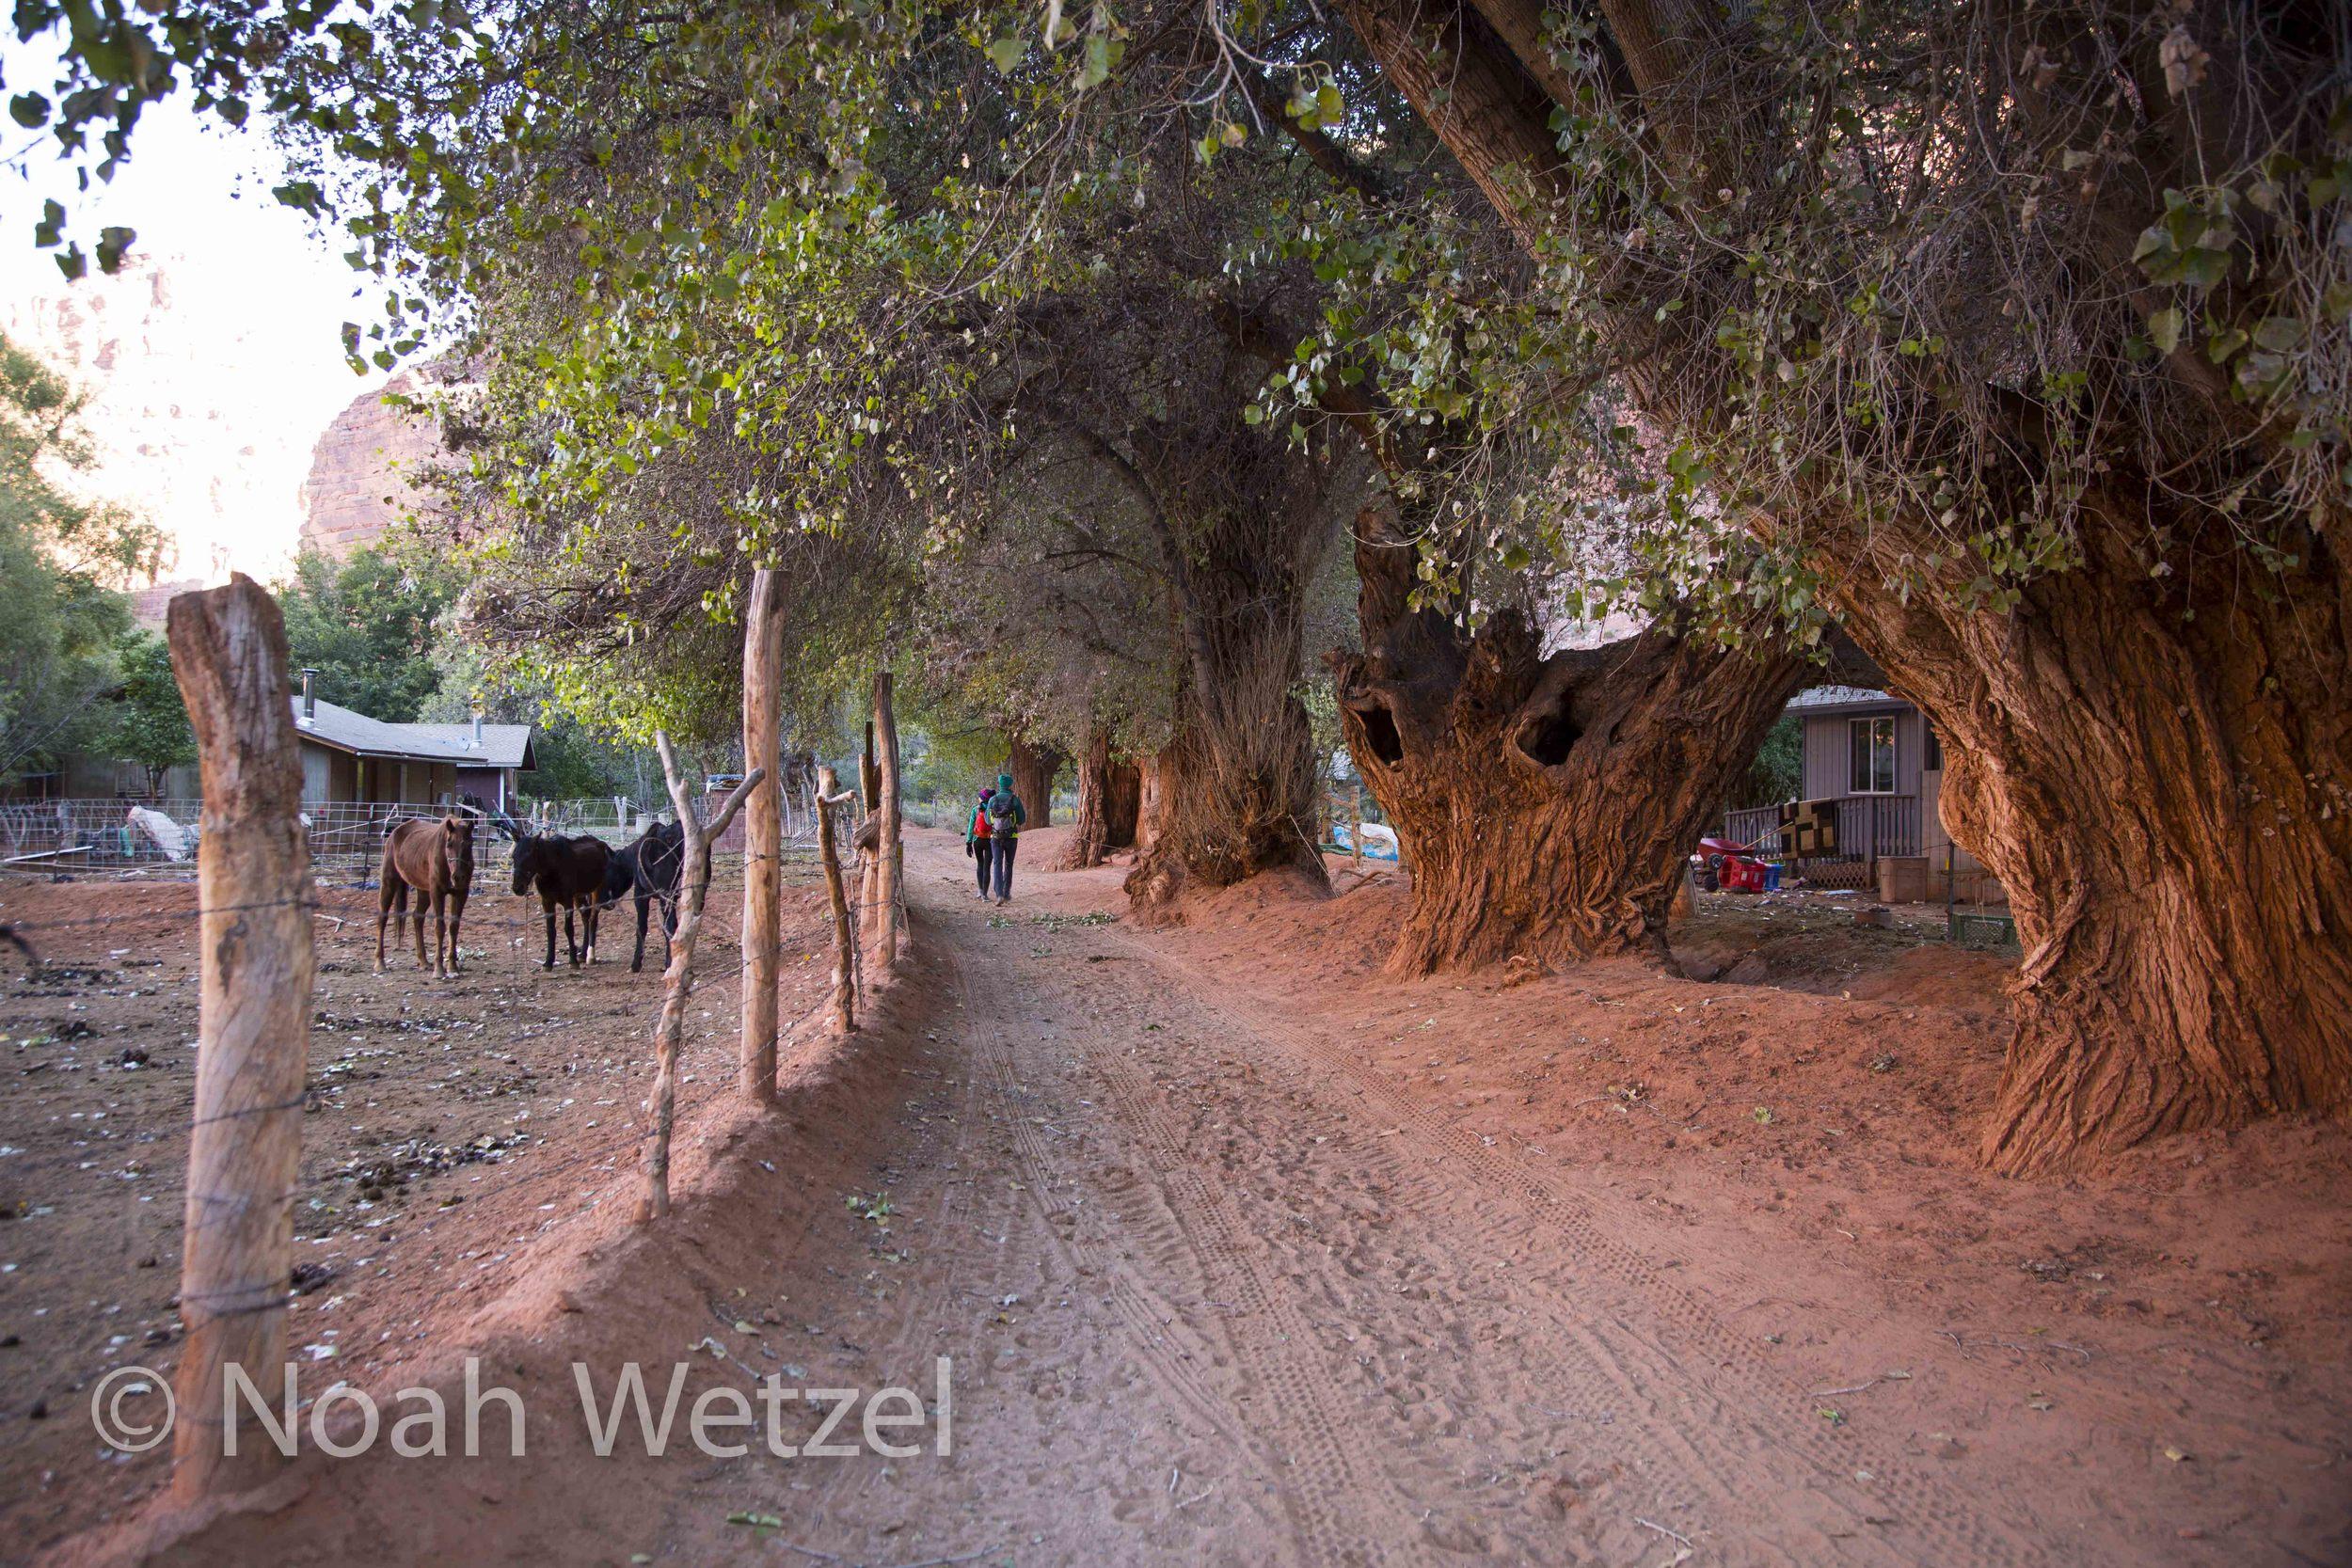 Entering the village of Supai, Arizona